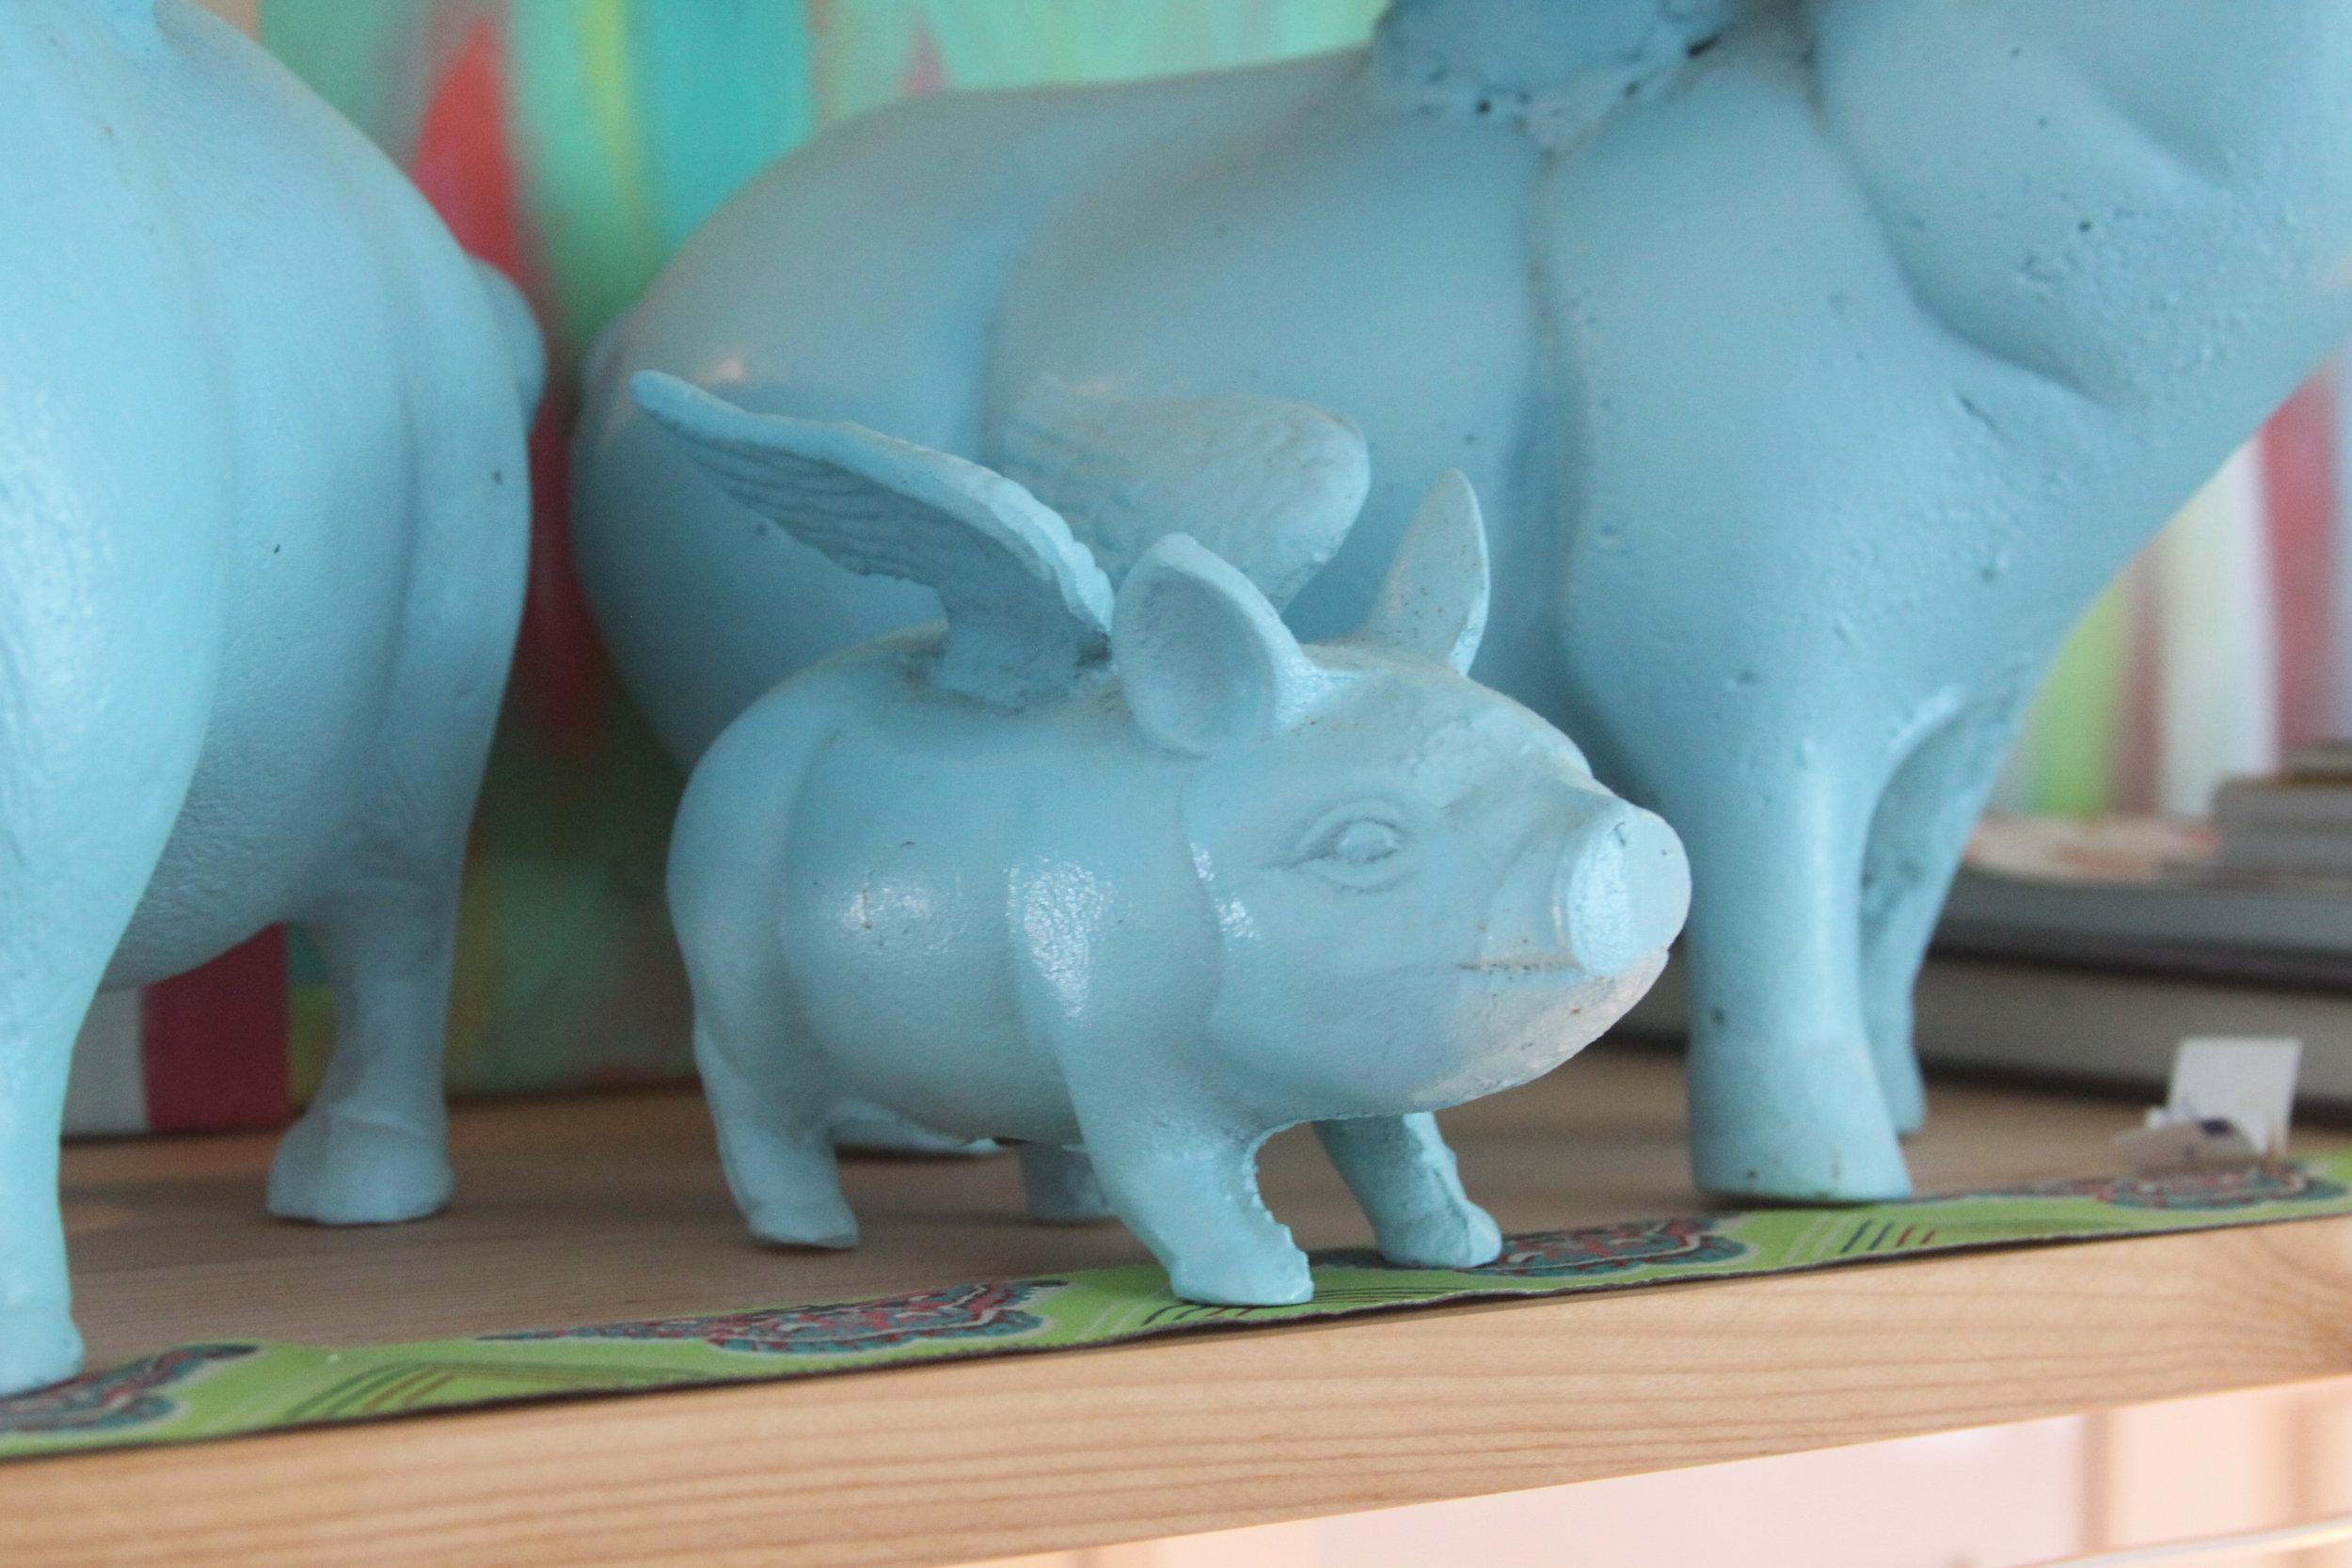 Flying Pigs on a Shelf in My Studio Bring Me Joy Each Day